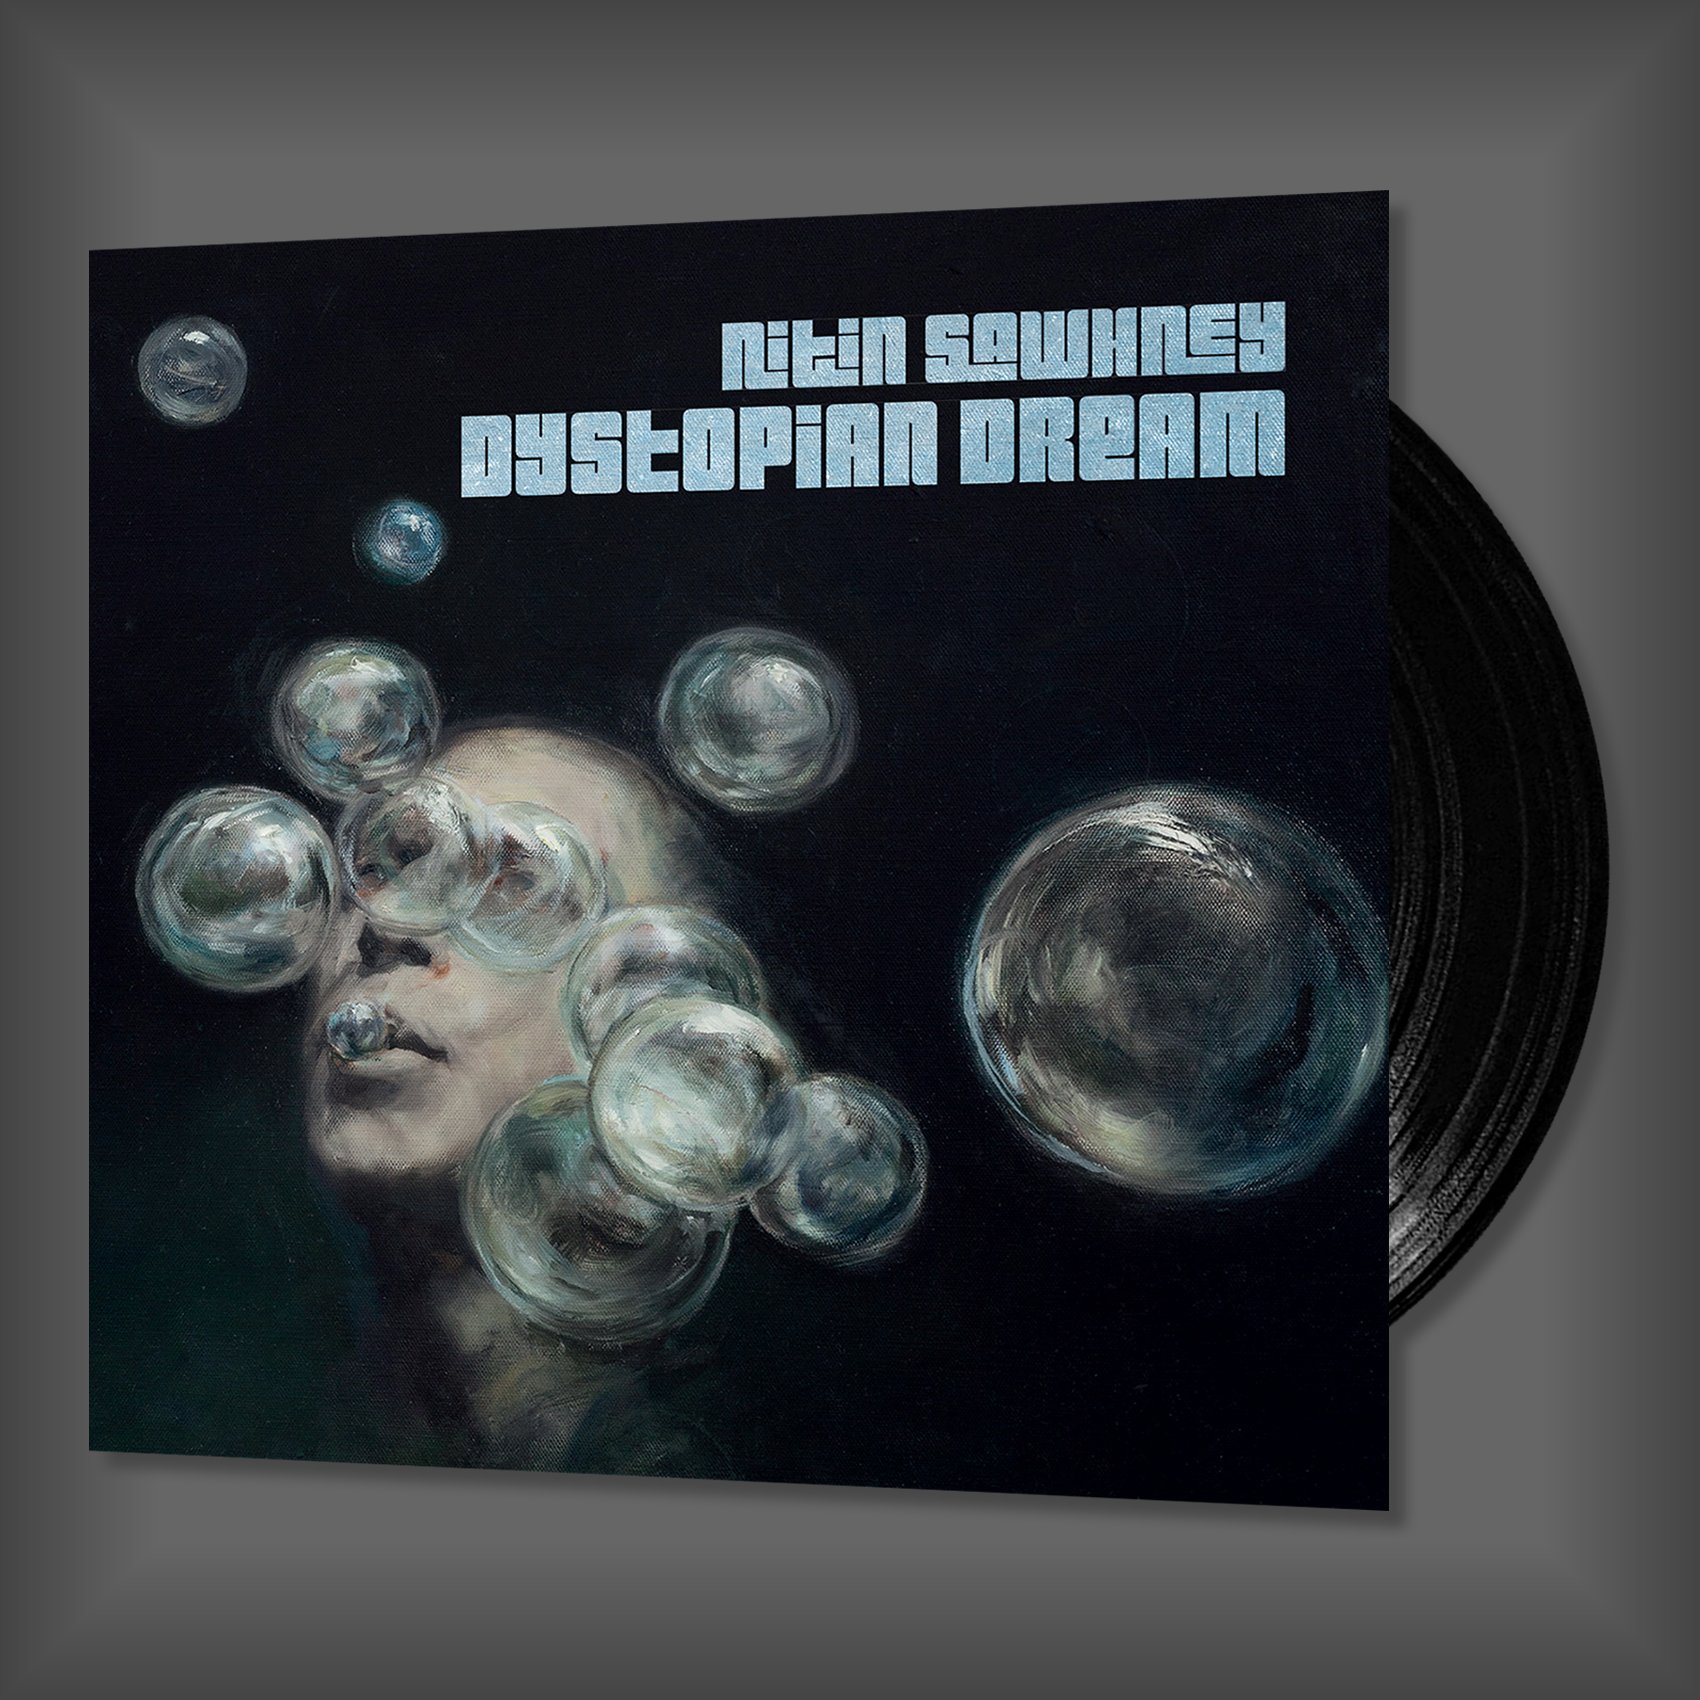 "Dystopian Dream (Signed 12"" 2LP Vinyl)"